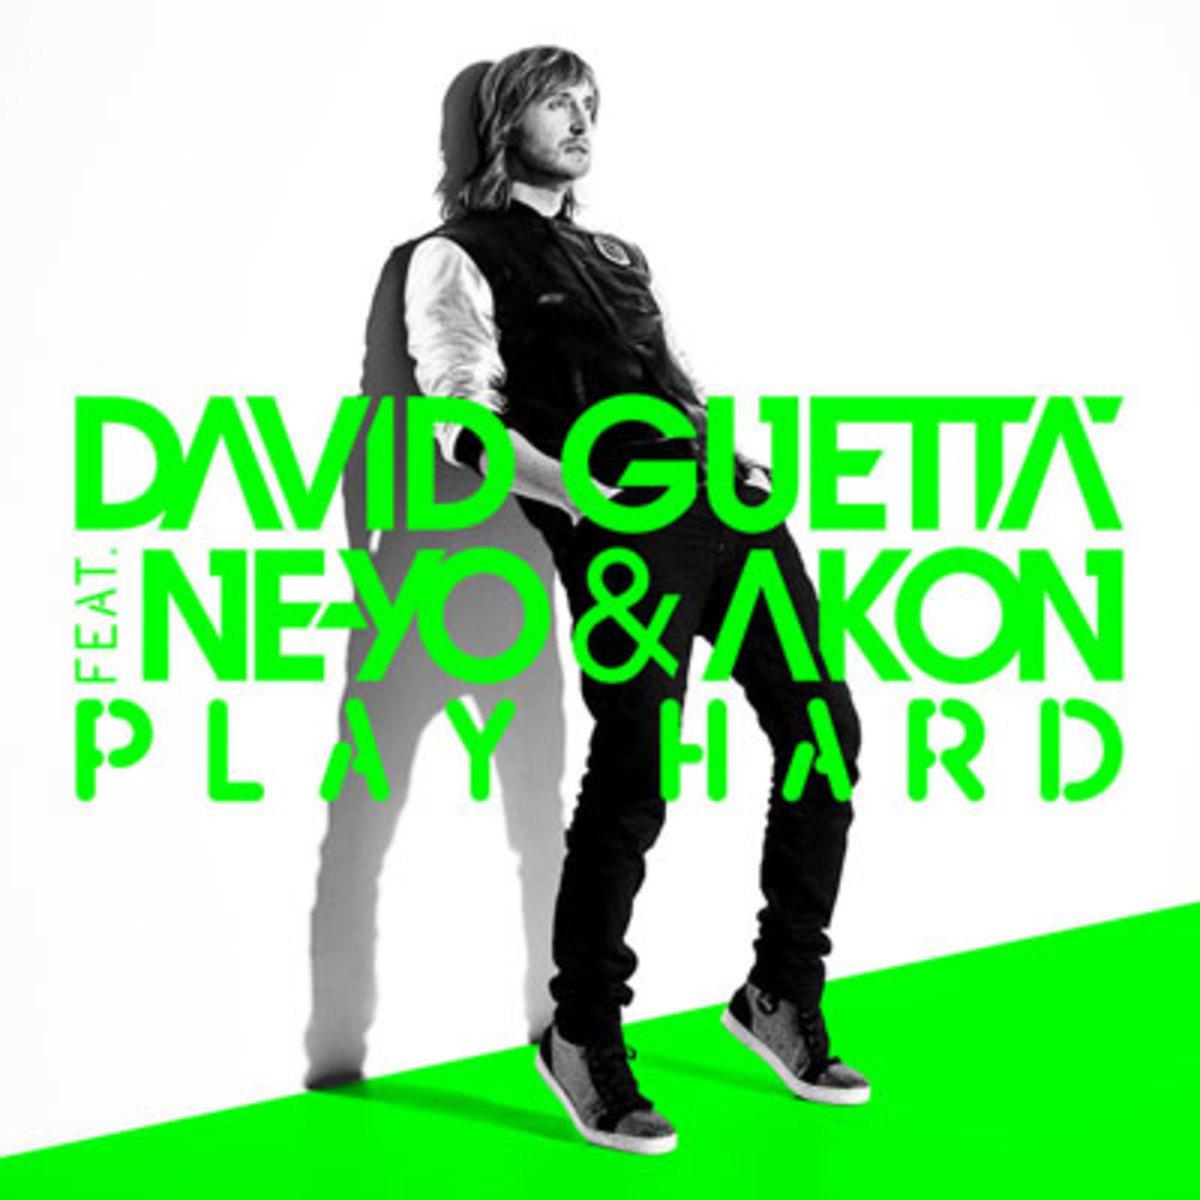 davidguetta-playhard.jpg